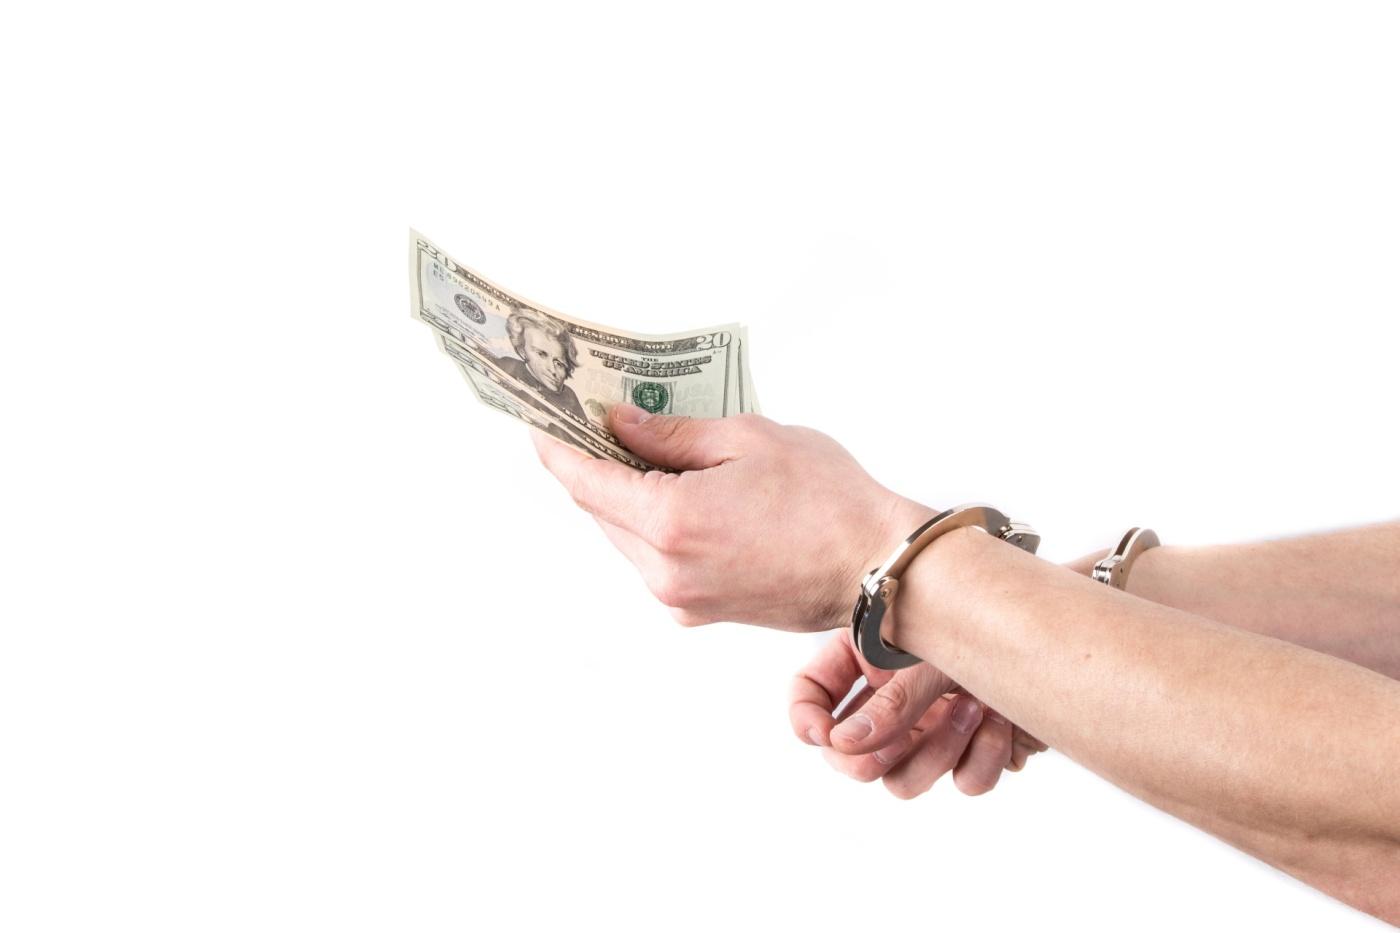 hands-in-handcuffs-hold-money-14626079489uy